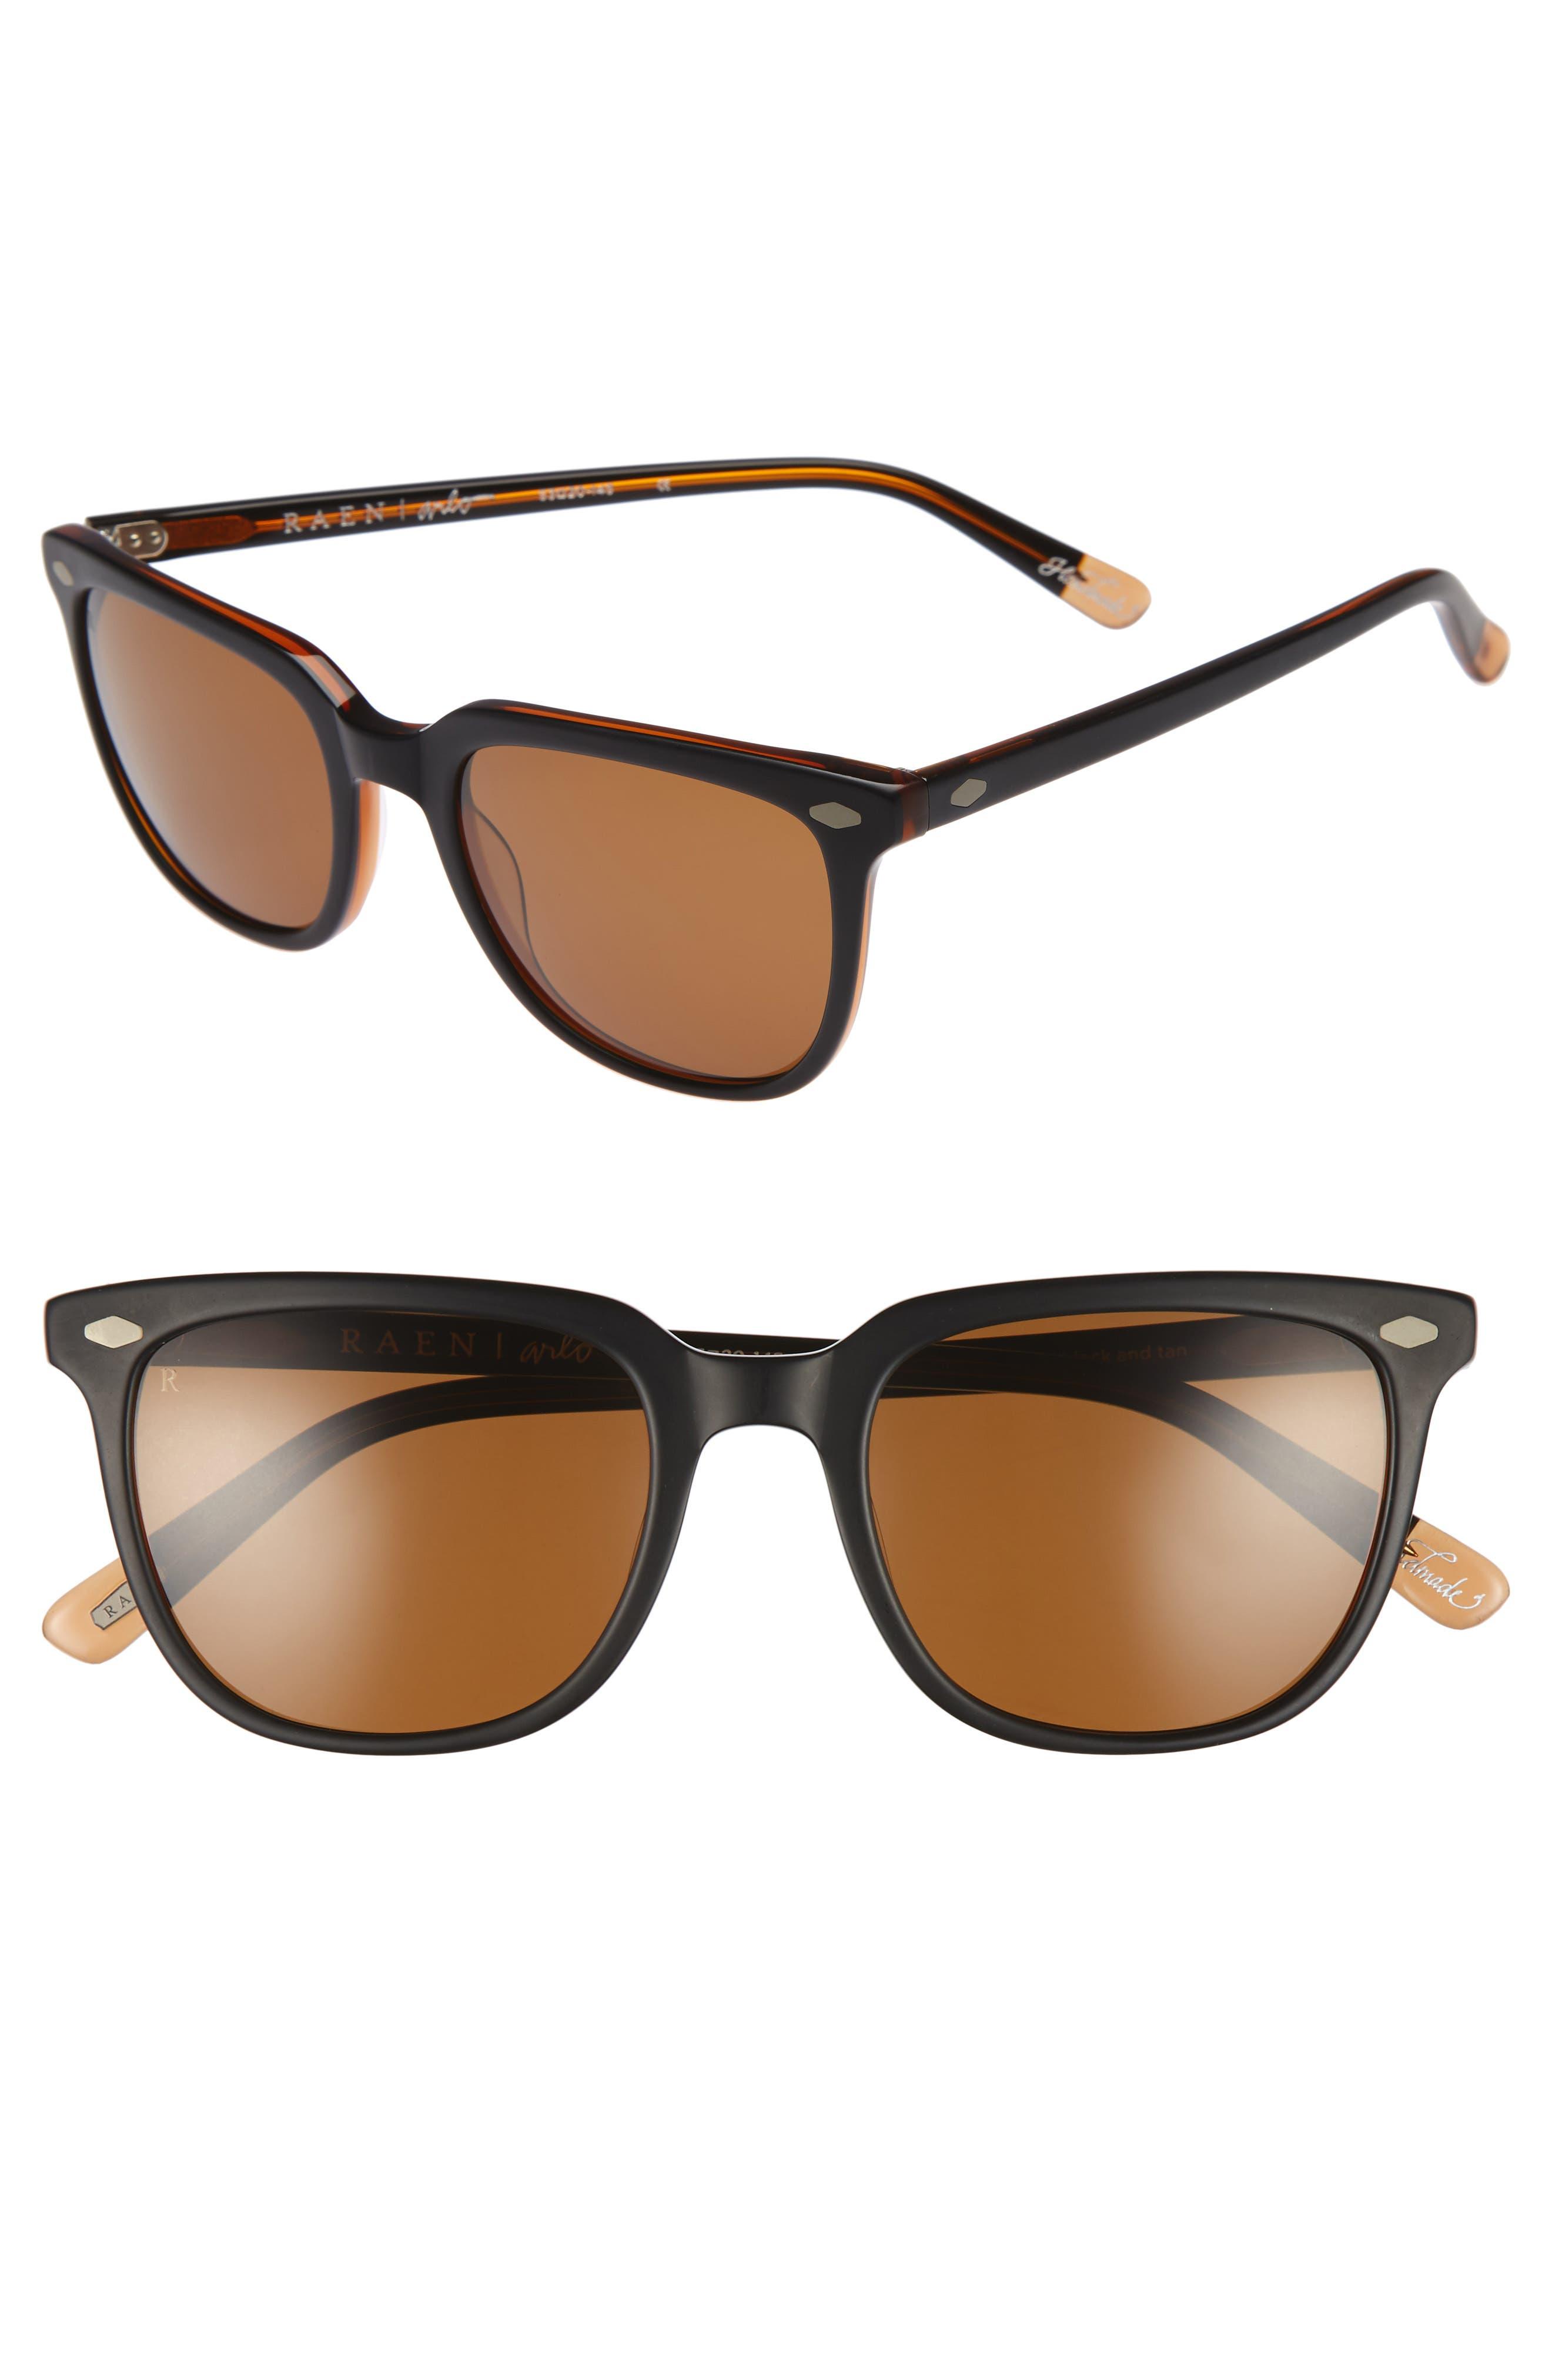 Arlo 53mm Polarized Sunglasses,                             Main thumbnail 1, color,                             Black/ Tan/ Brown